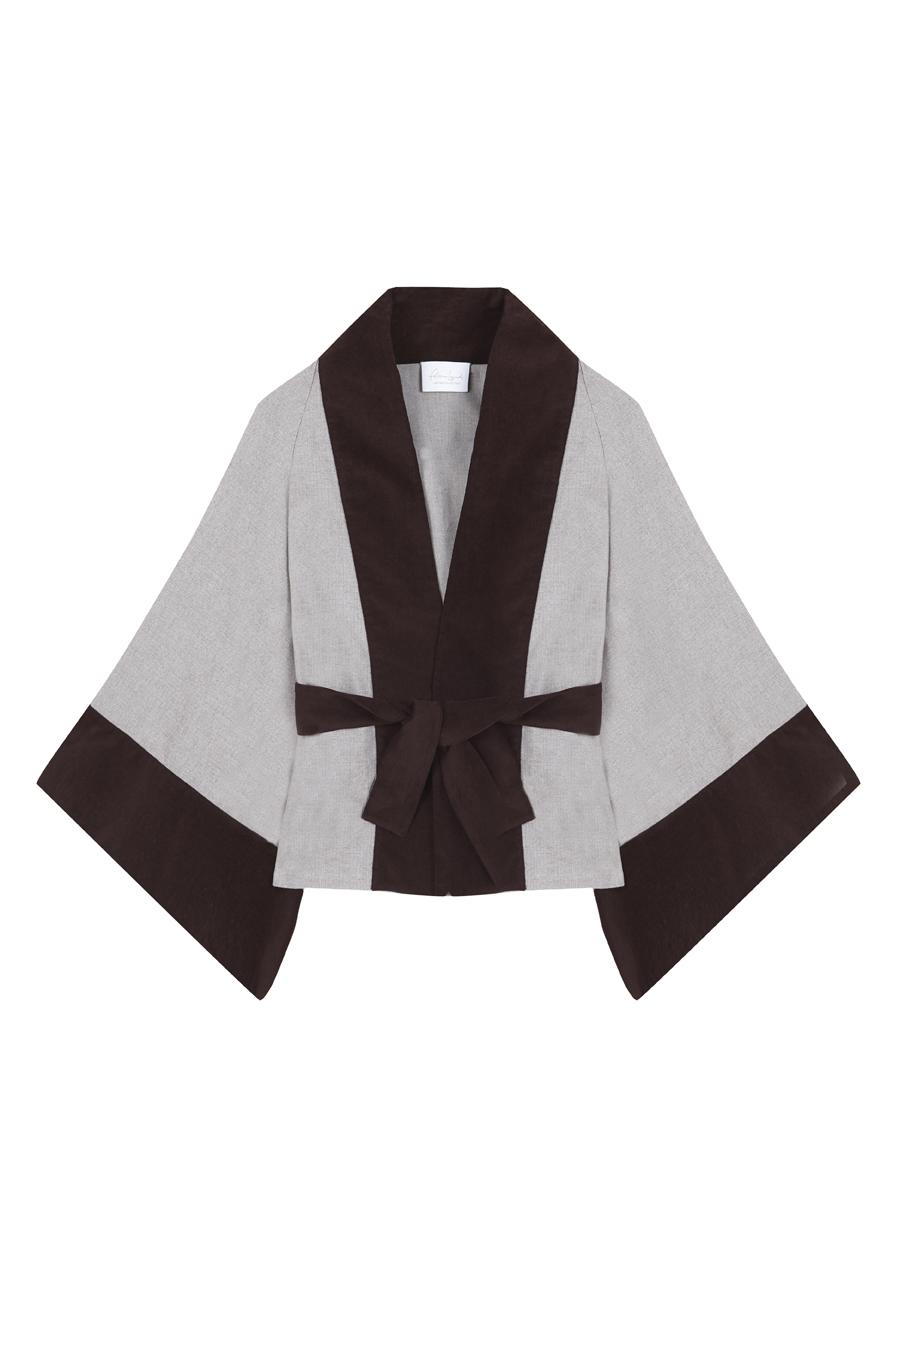 kimono corto tipo blazer de algodon con dibujo de espiga en tono crudo y bordes de terciopelo opaco color marron